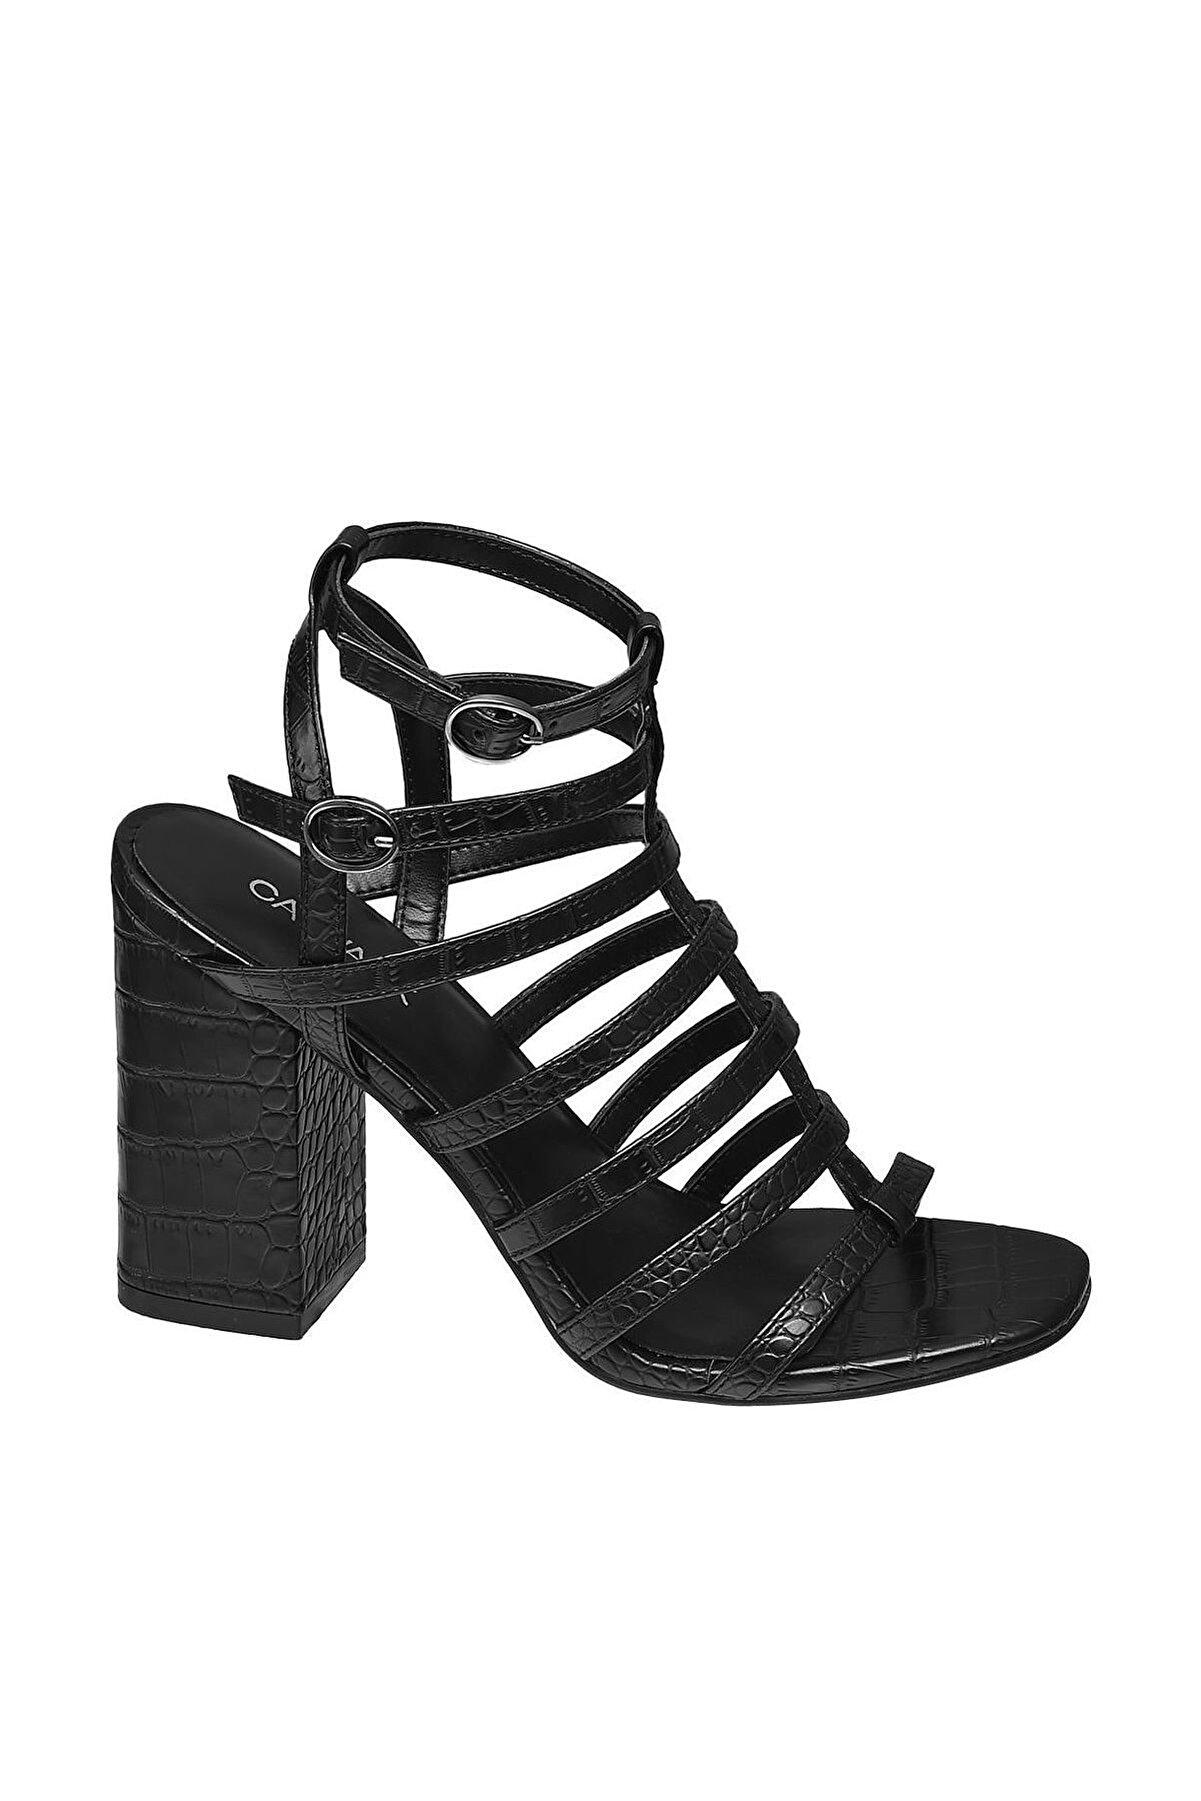 Catwalk Deichmann Siyah Topuklu Sandalet